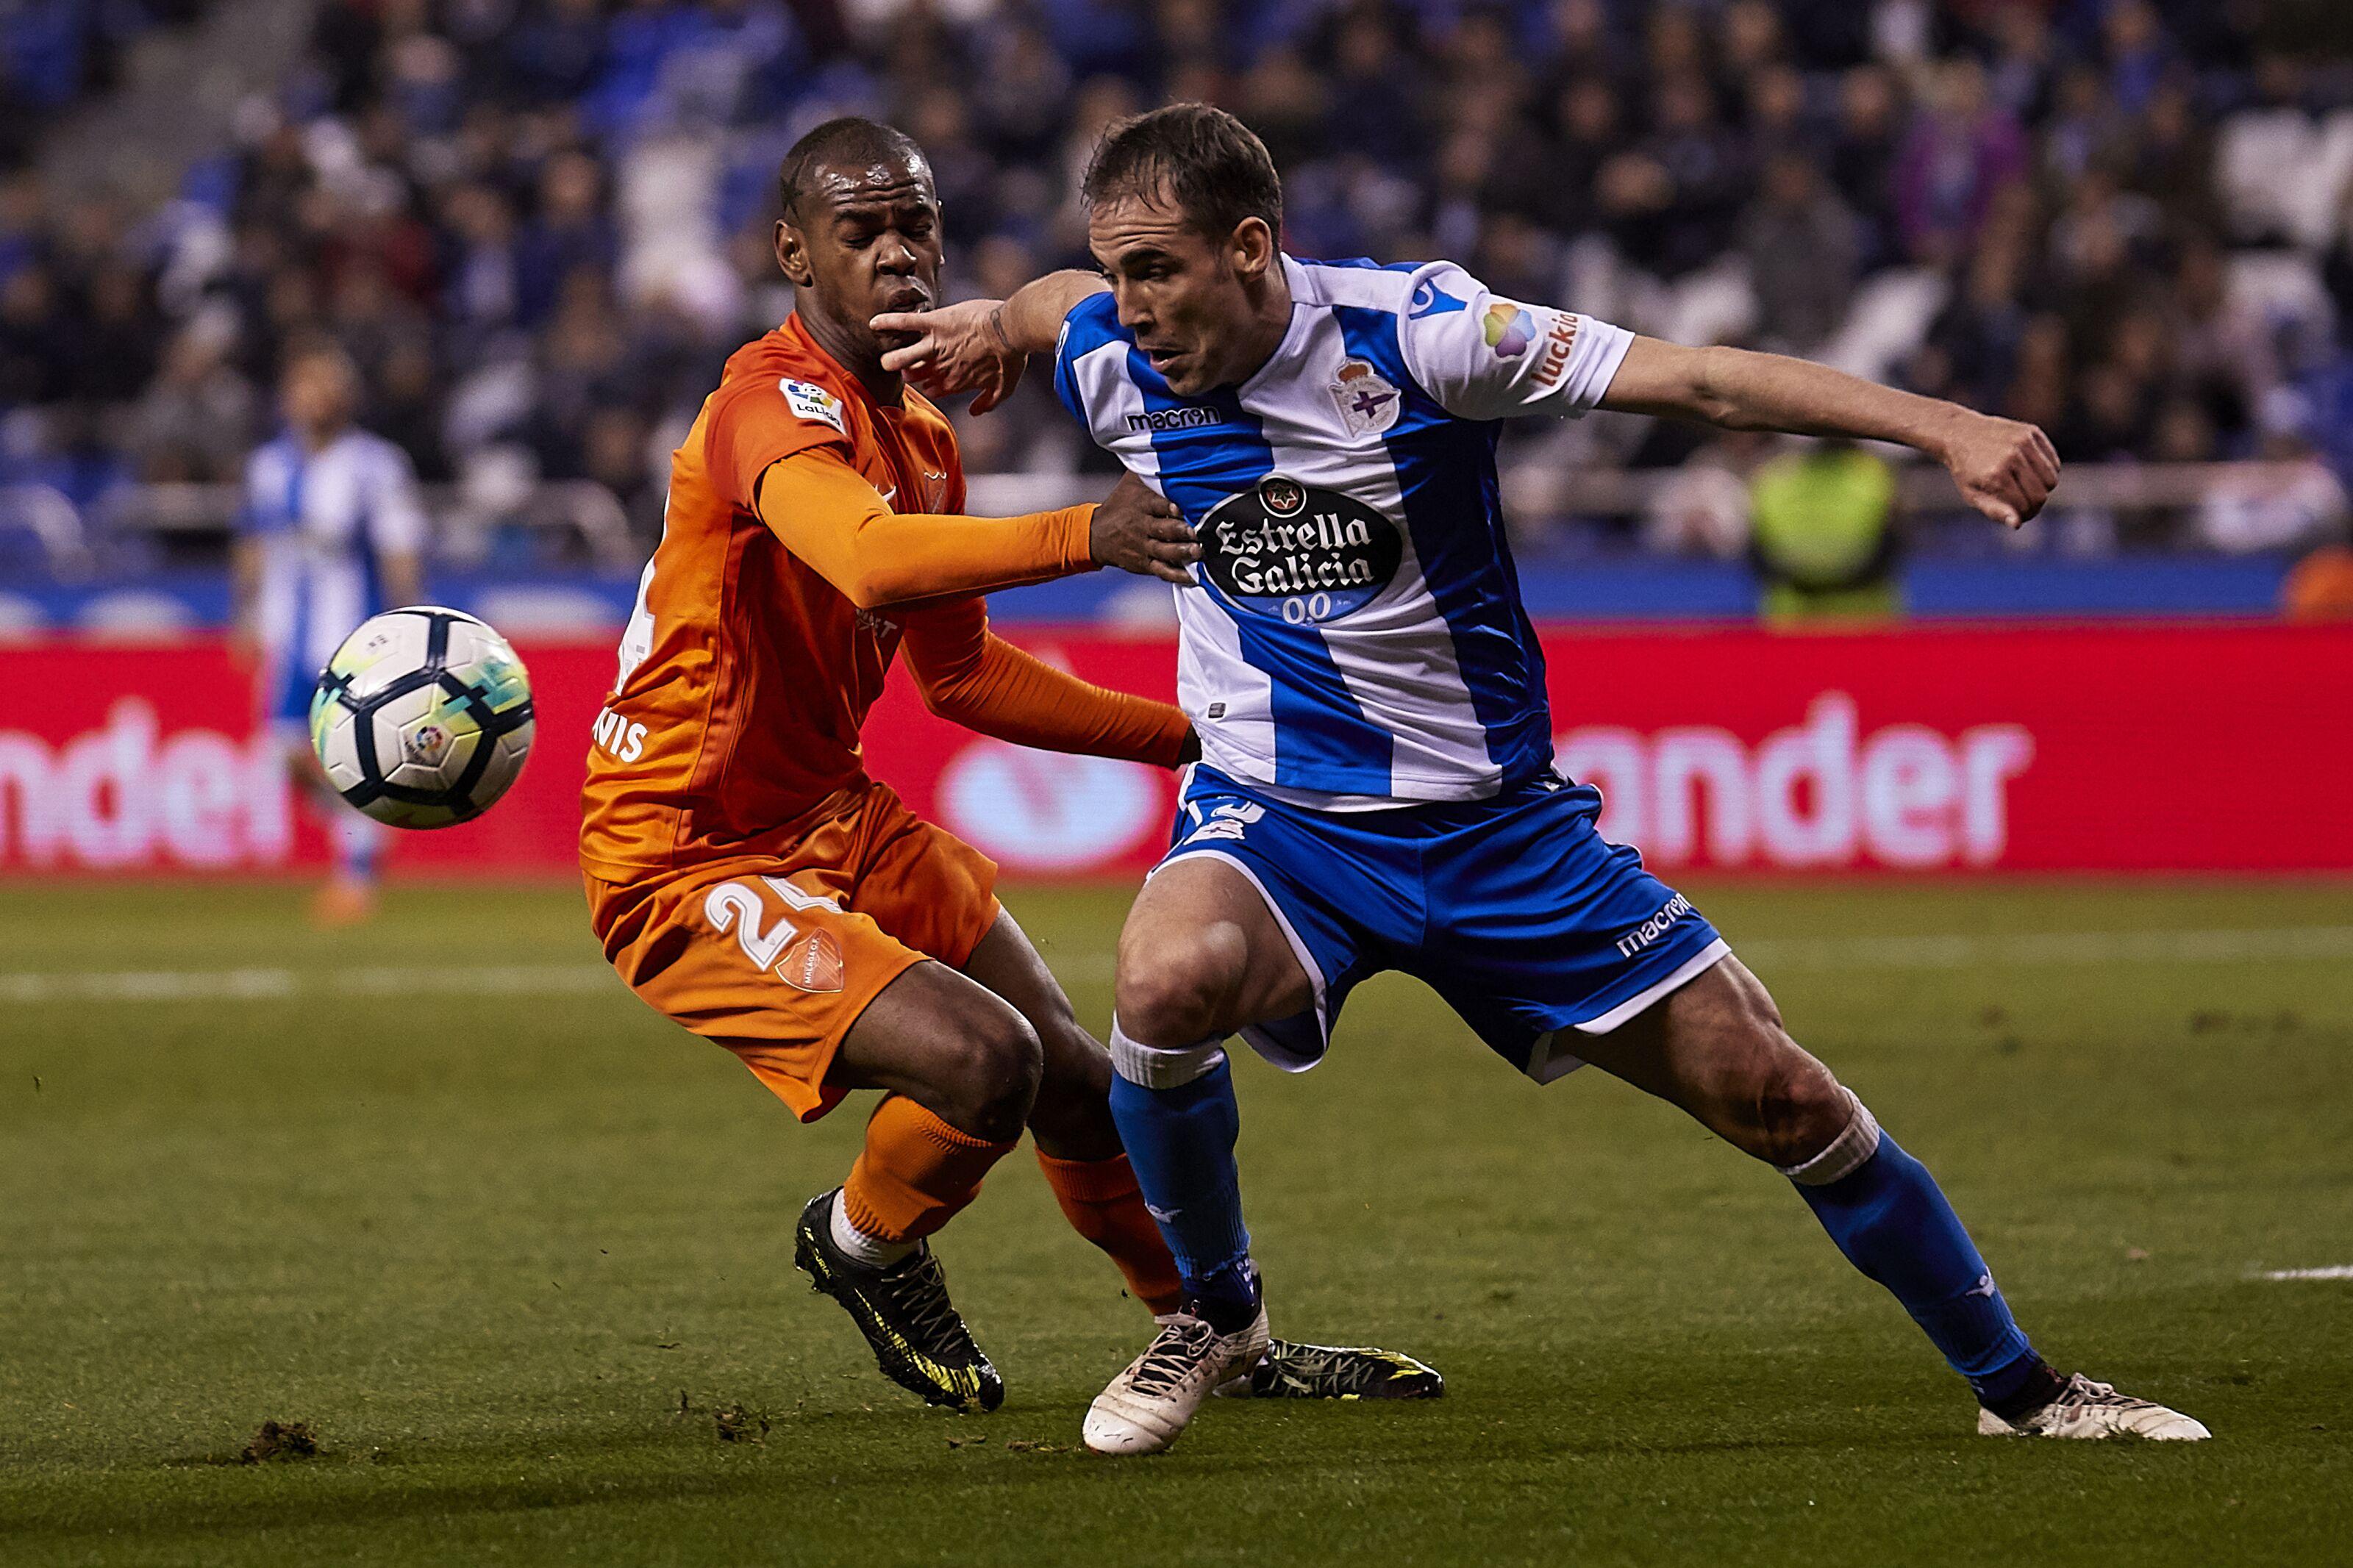 Watch Getafe Cf Vs Real Madrid Live Stream La Liga: Malaga Vs. Real Madrid Live Stream: Watch La Liga Online